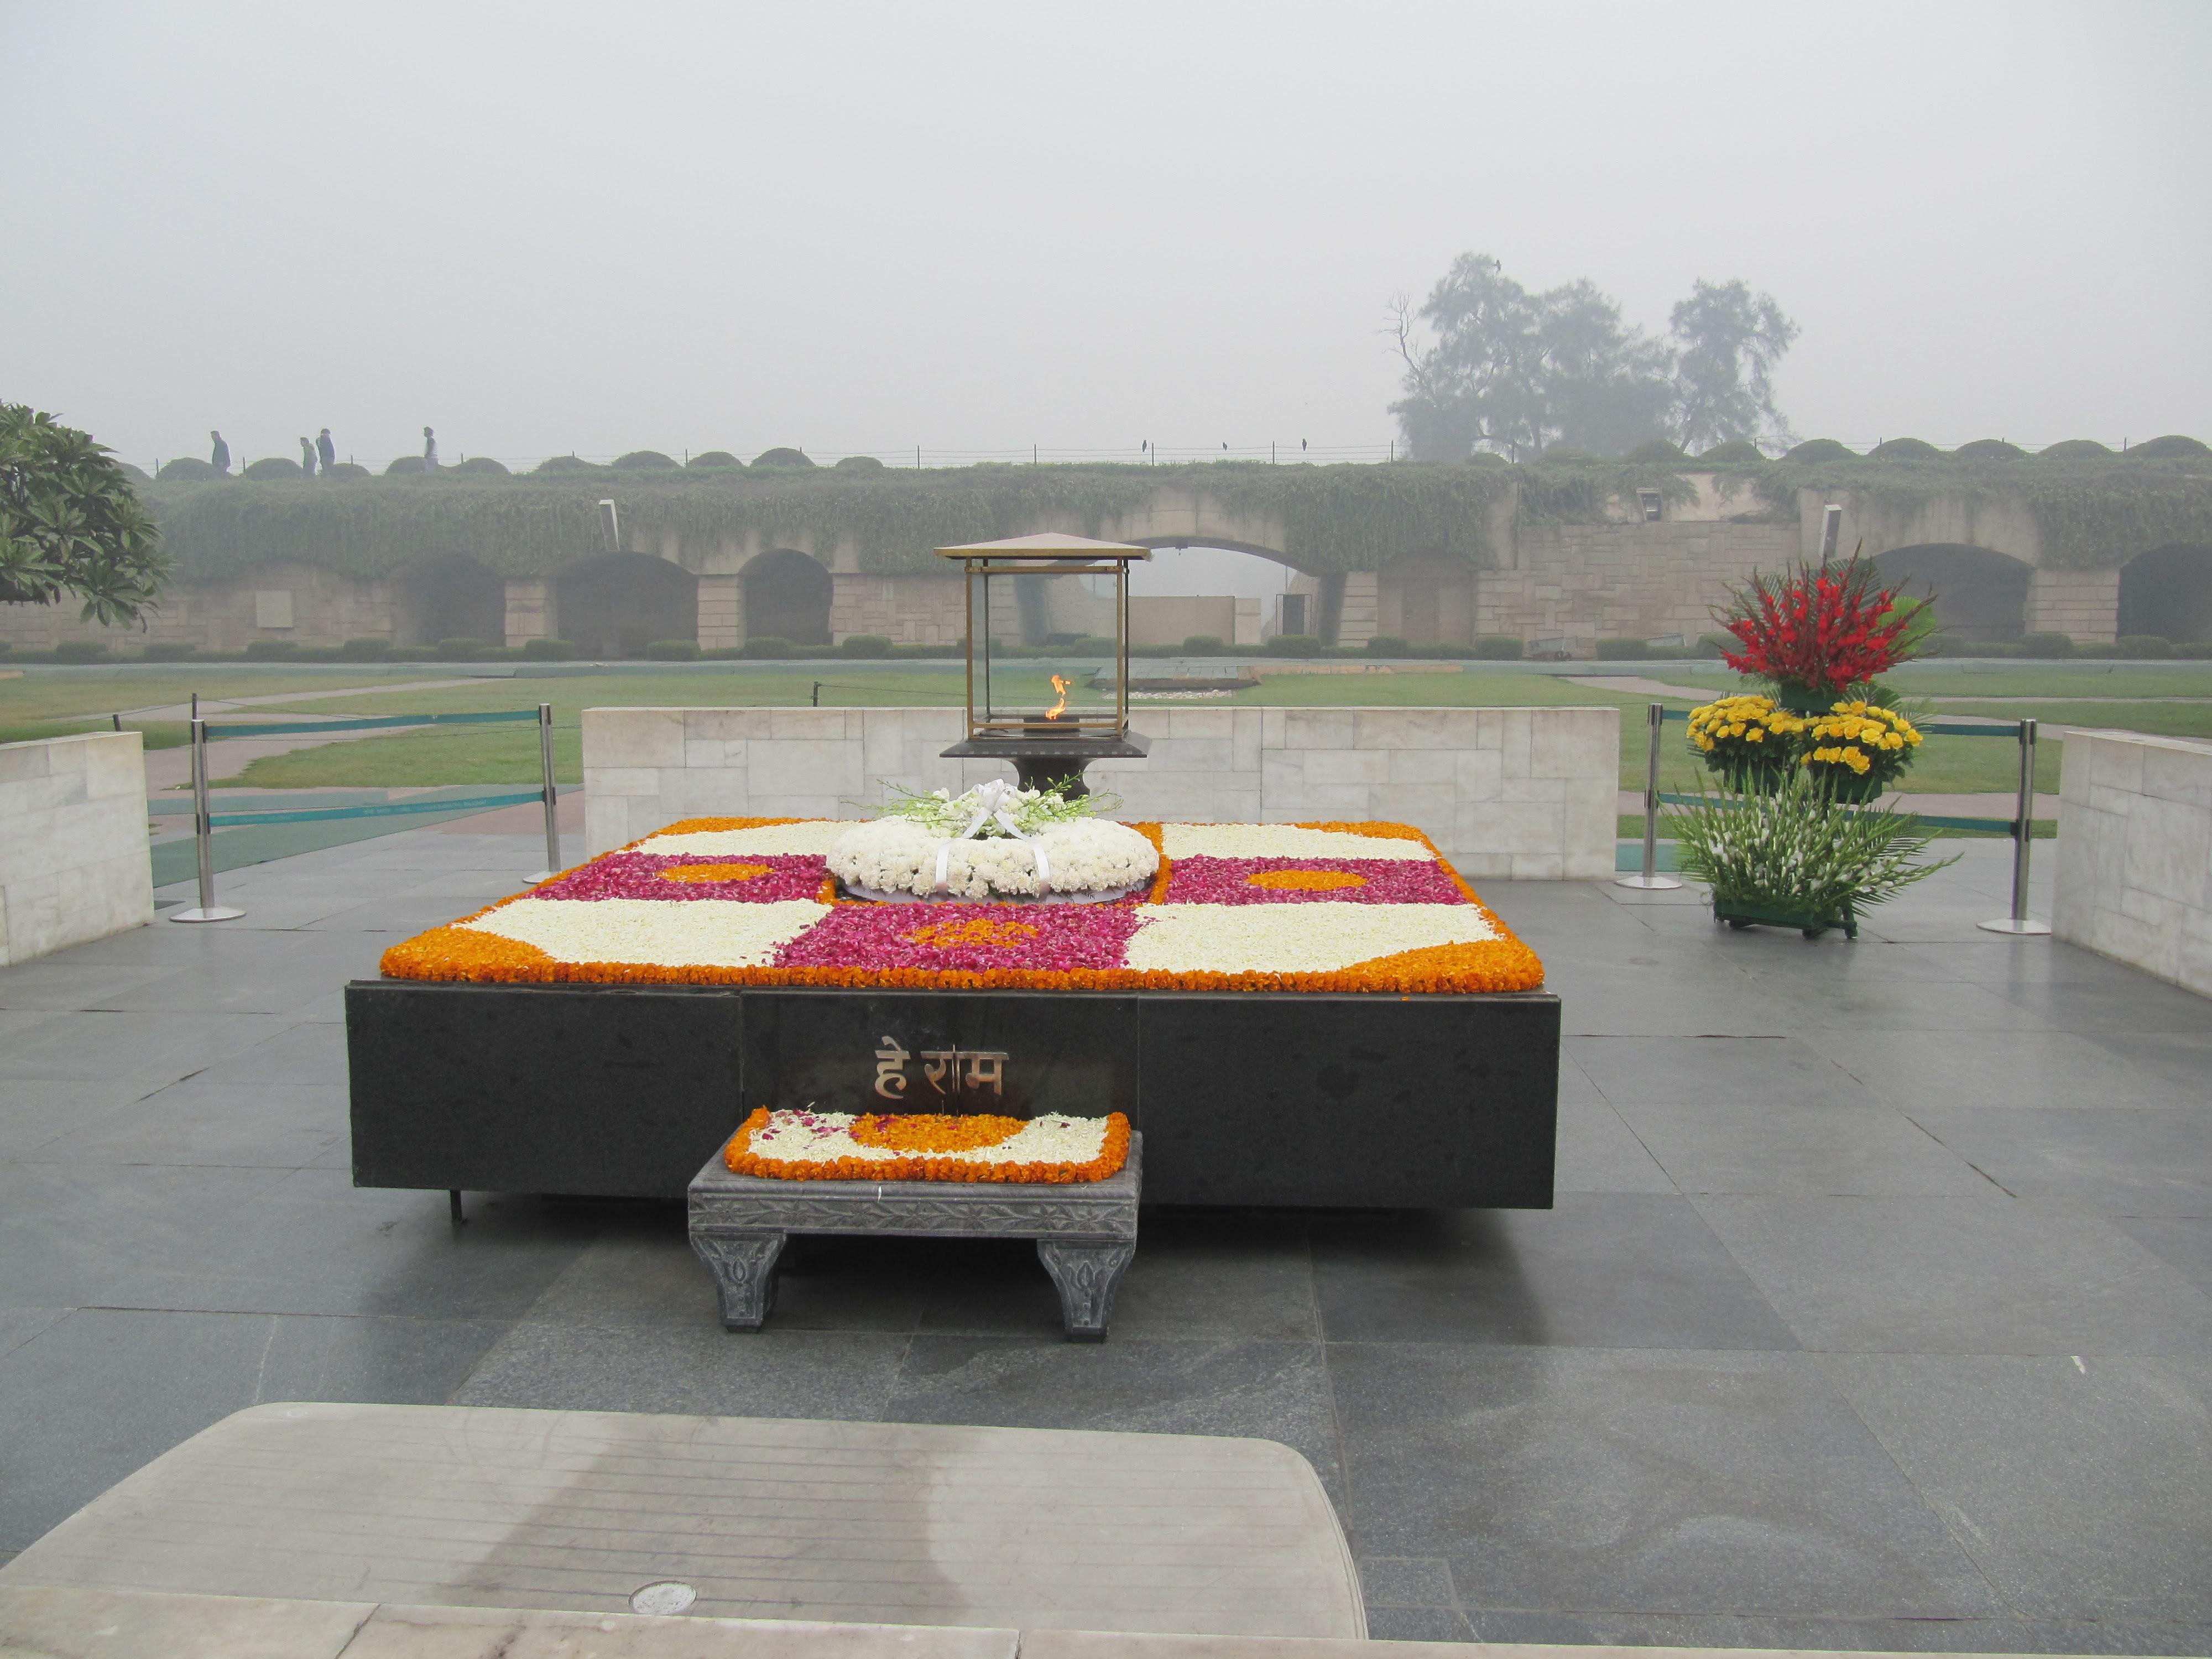 http://upload.wikimedia.org/wikipedia/commons/b/b2/Rajghat_Delhi.JPG